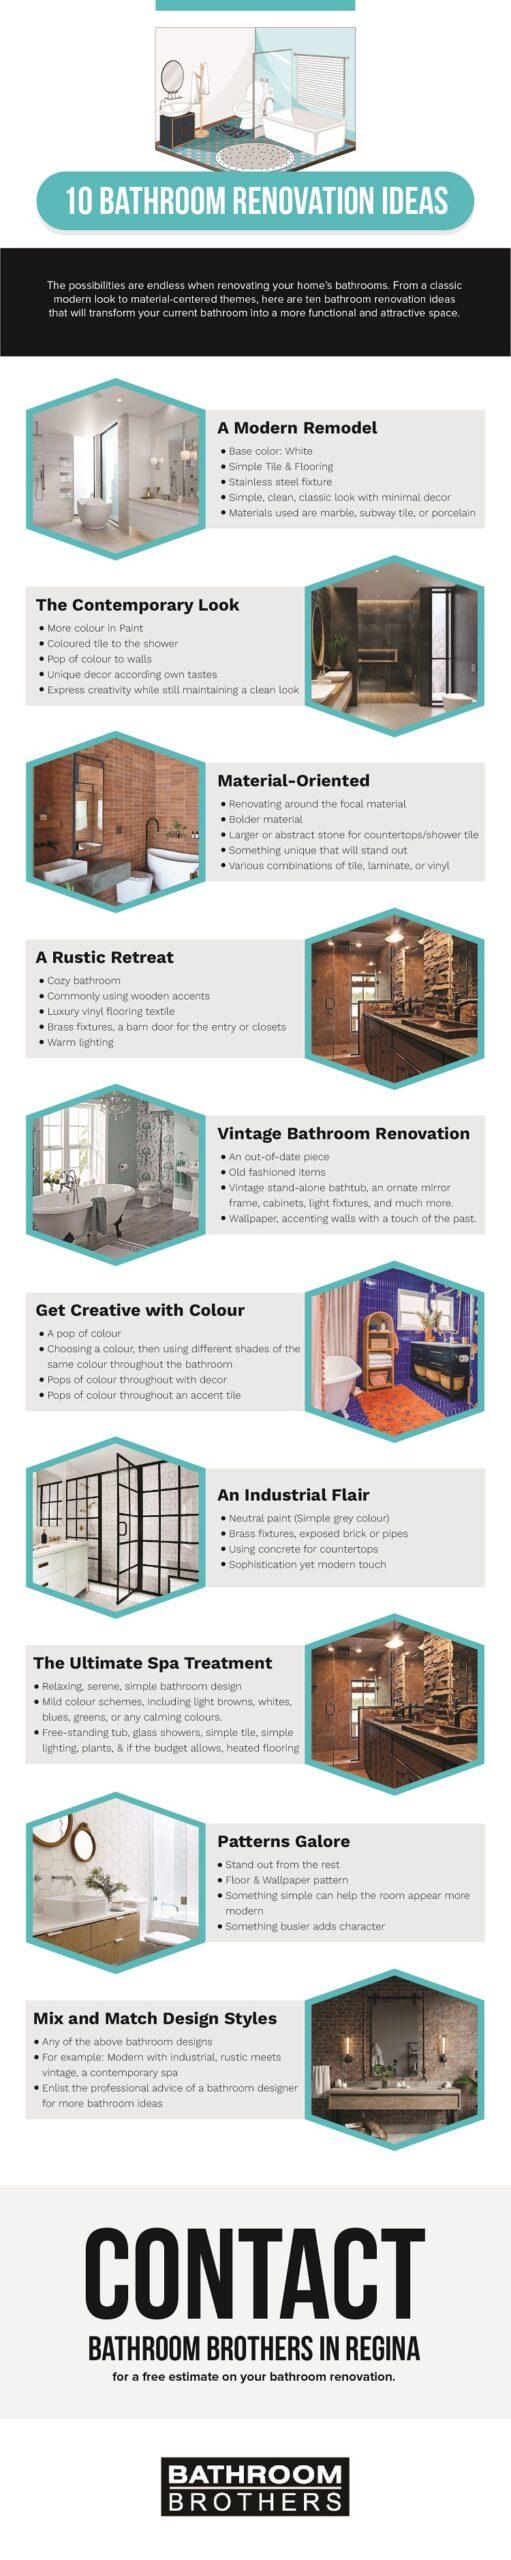 10 bathroom renovation ideas